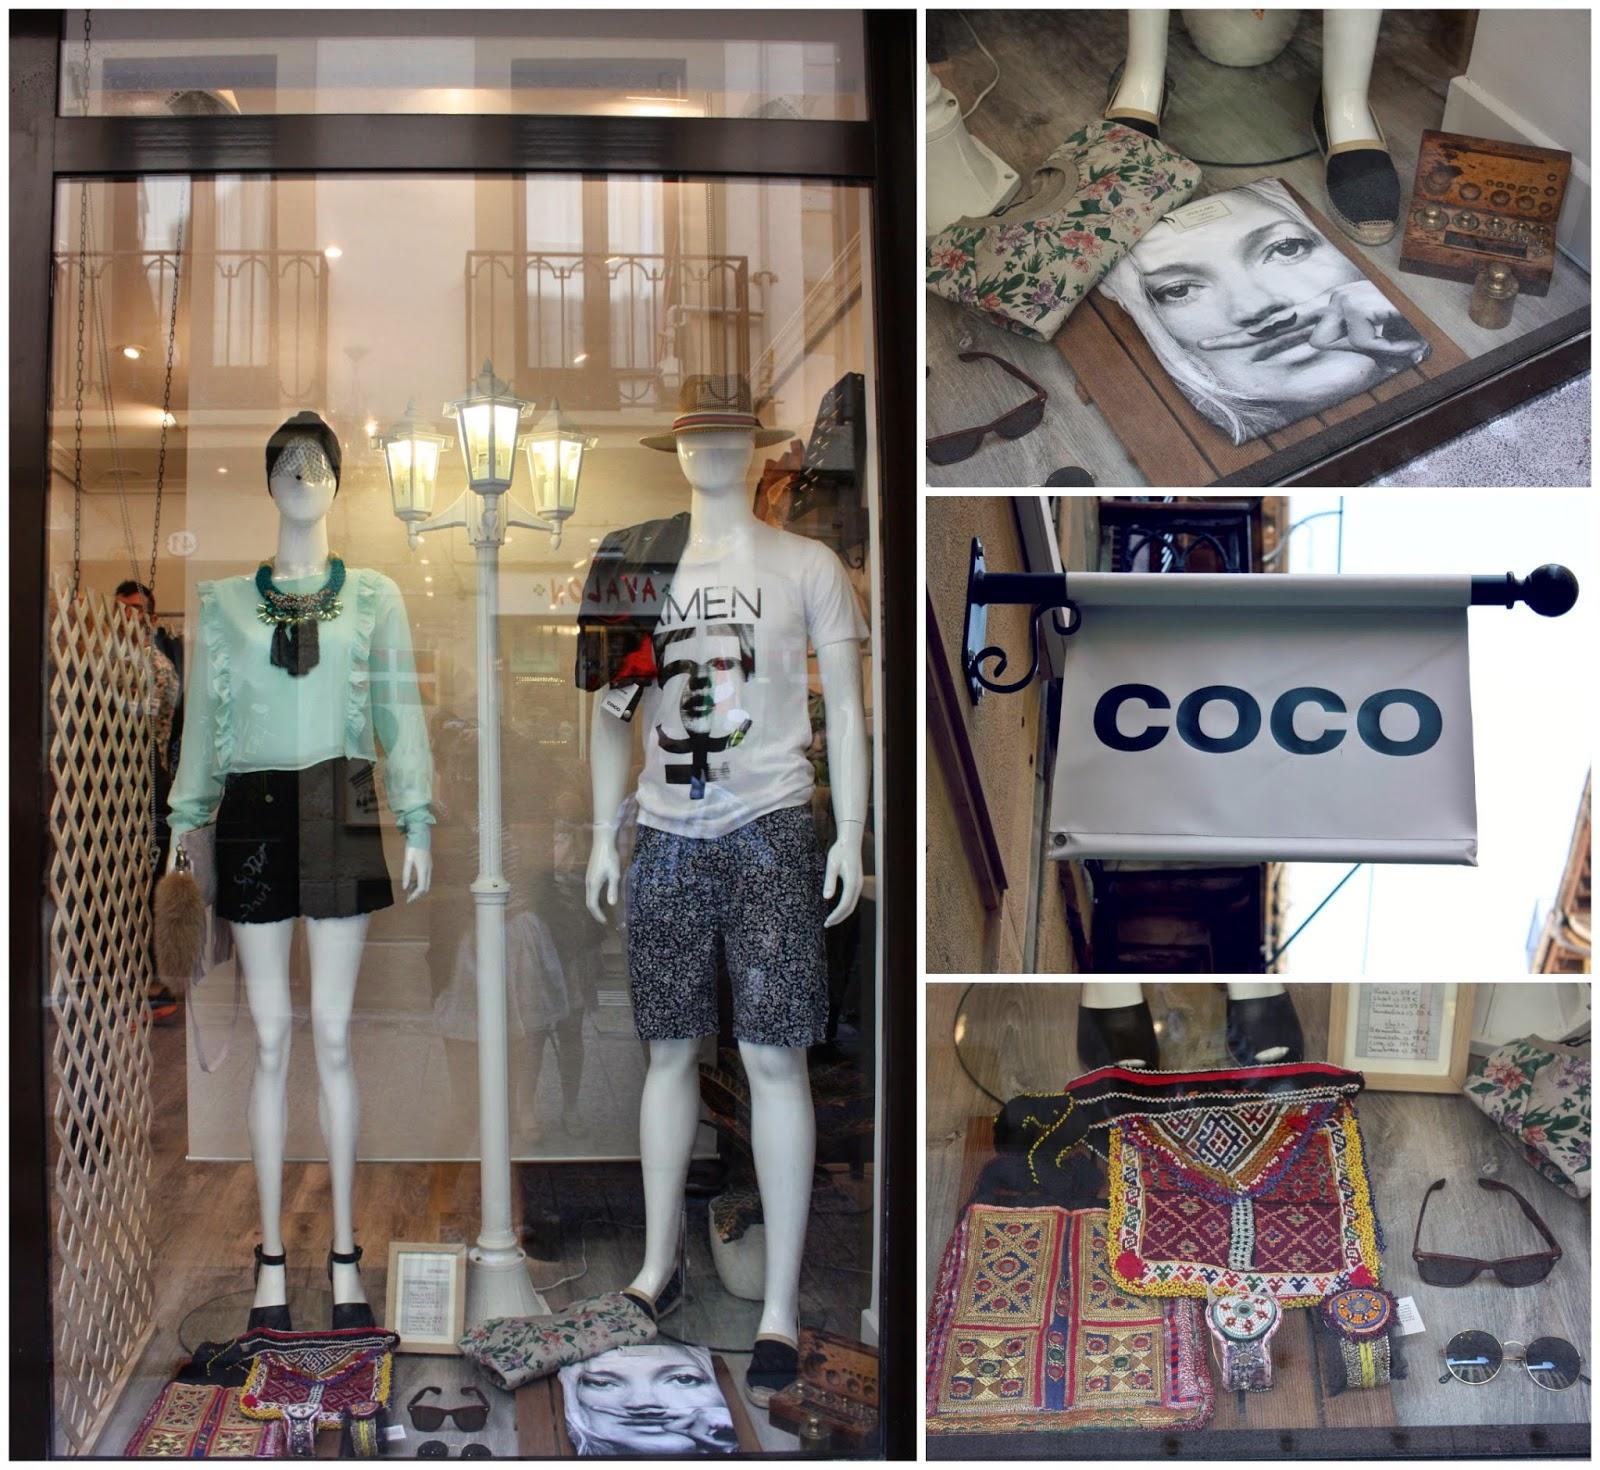 Keep in touch: Descubriendo Coco